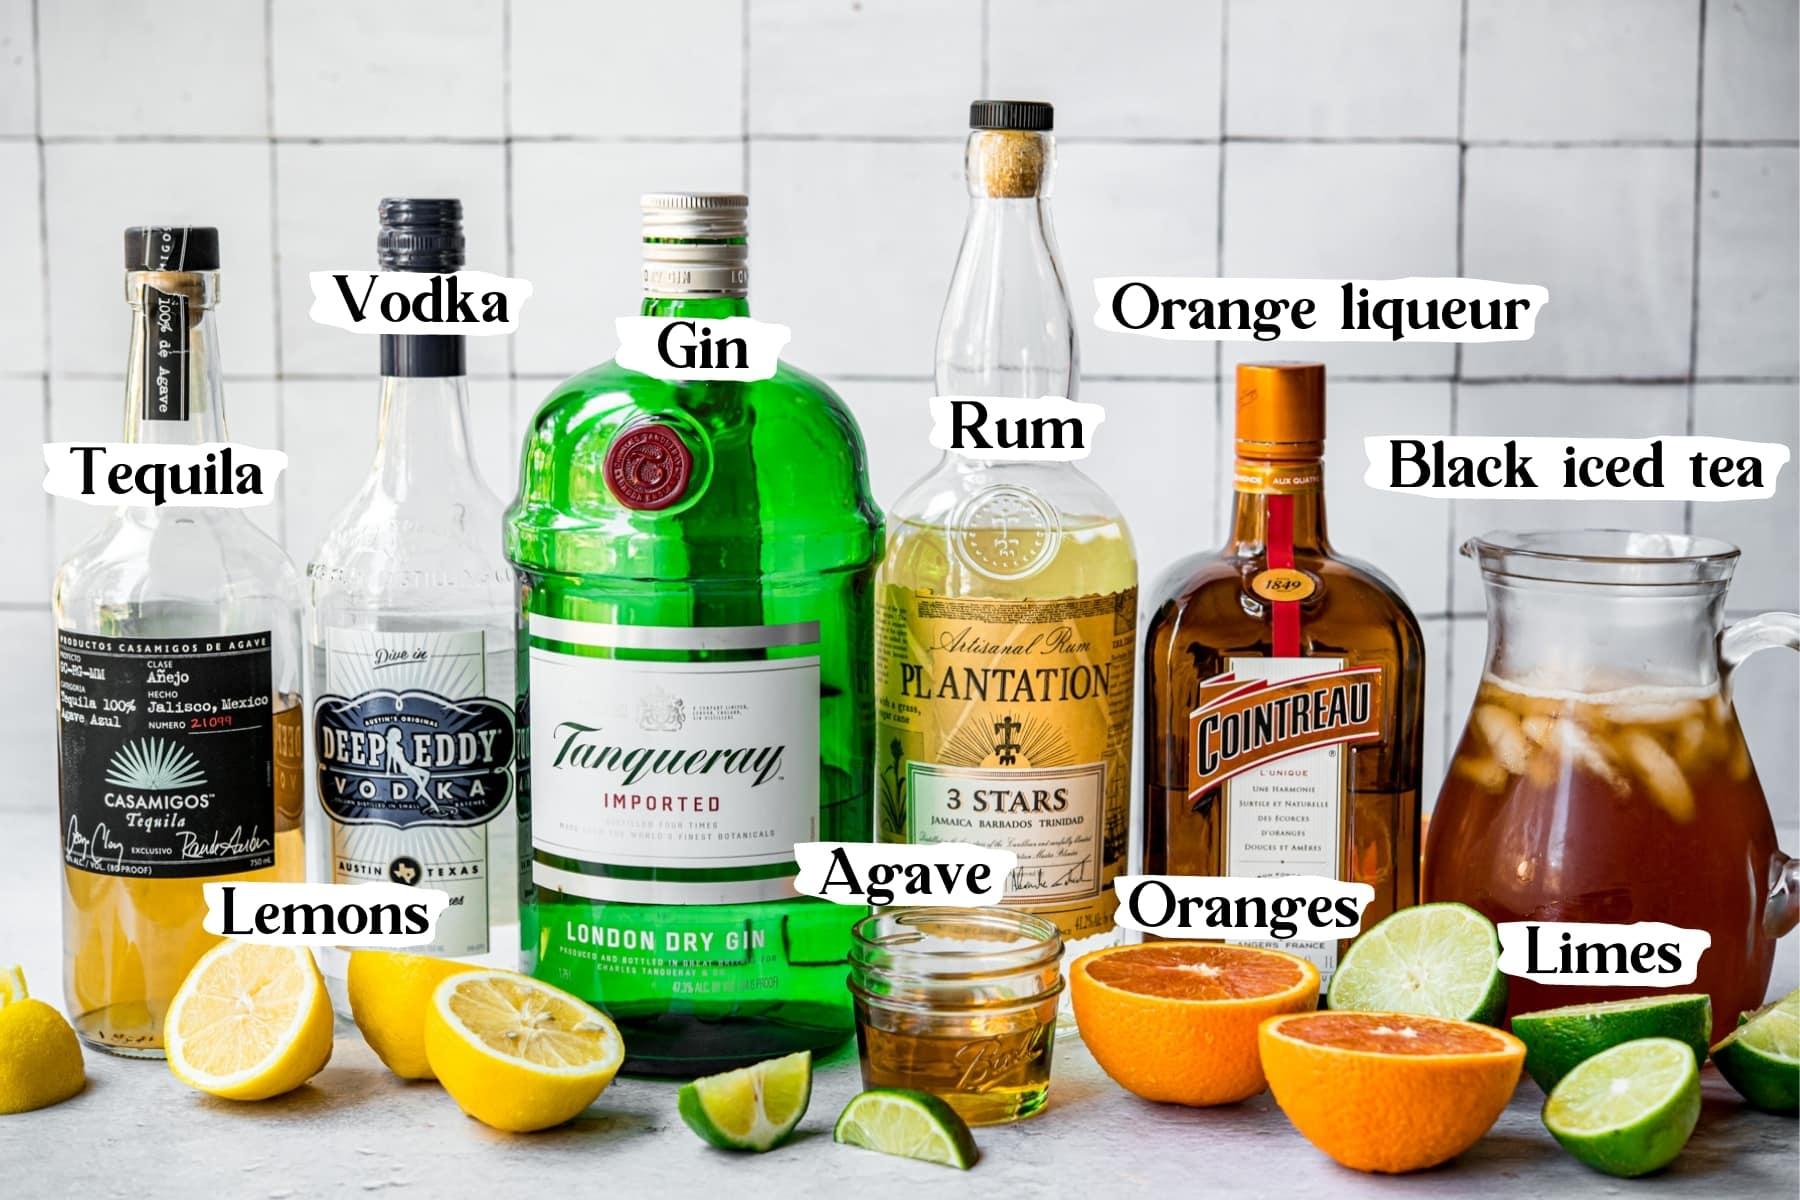 Long island iced tea ingredients: tequila, vodka, gin, rum, orange liqueur, black iced tea, lemons, agave, oranges, limes.